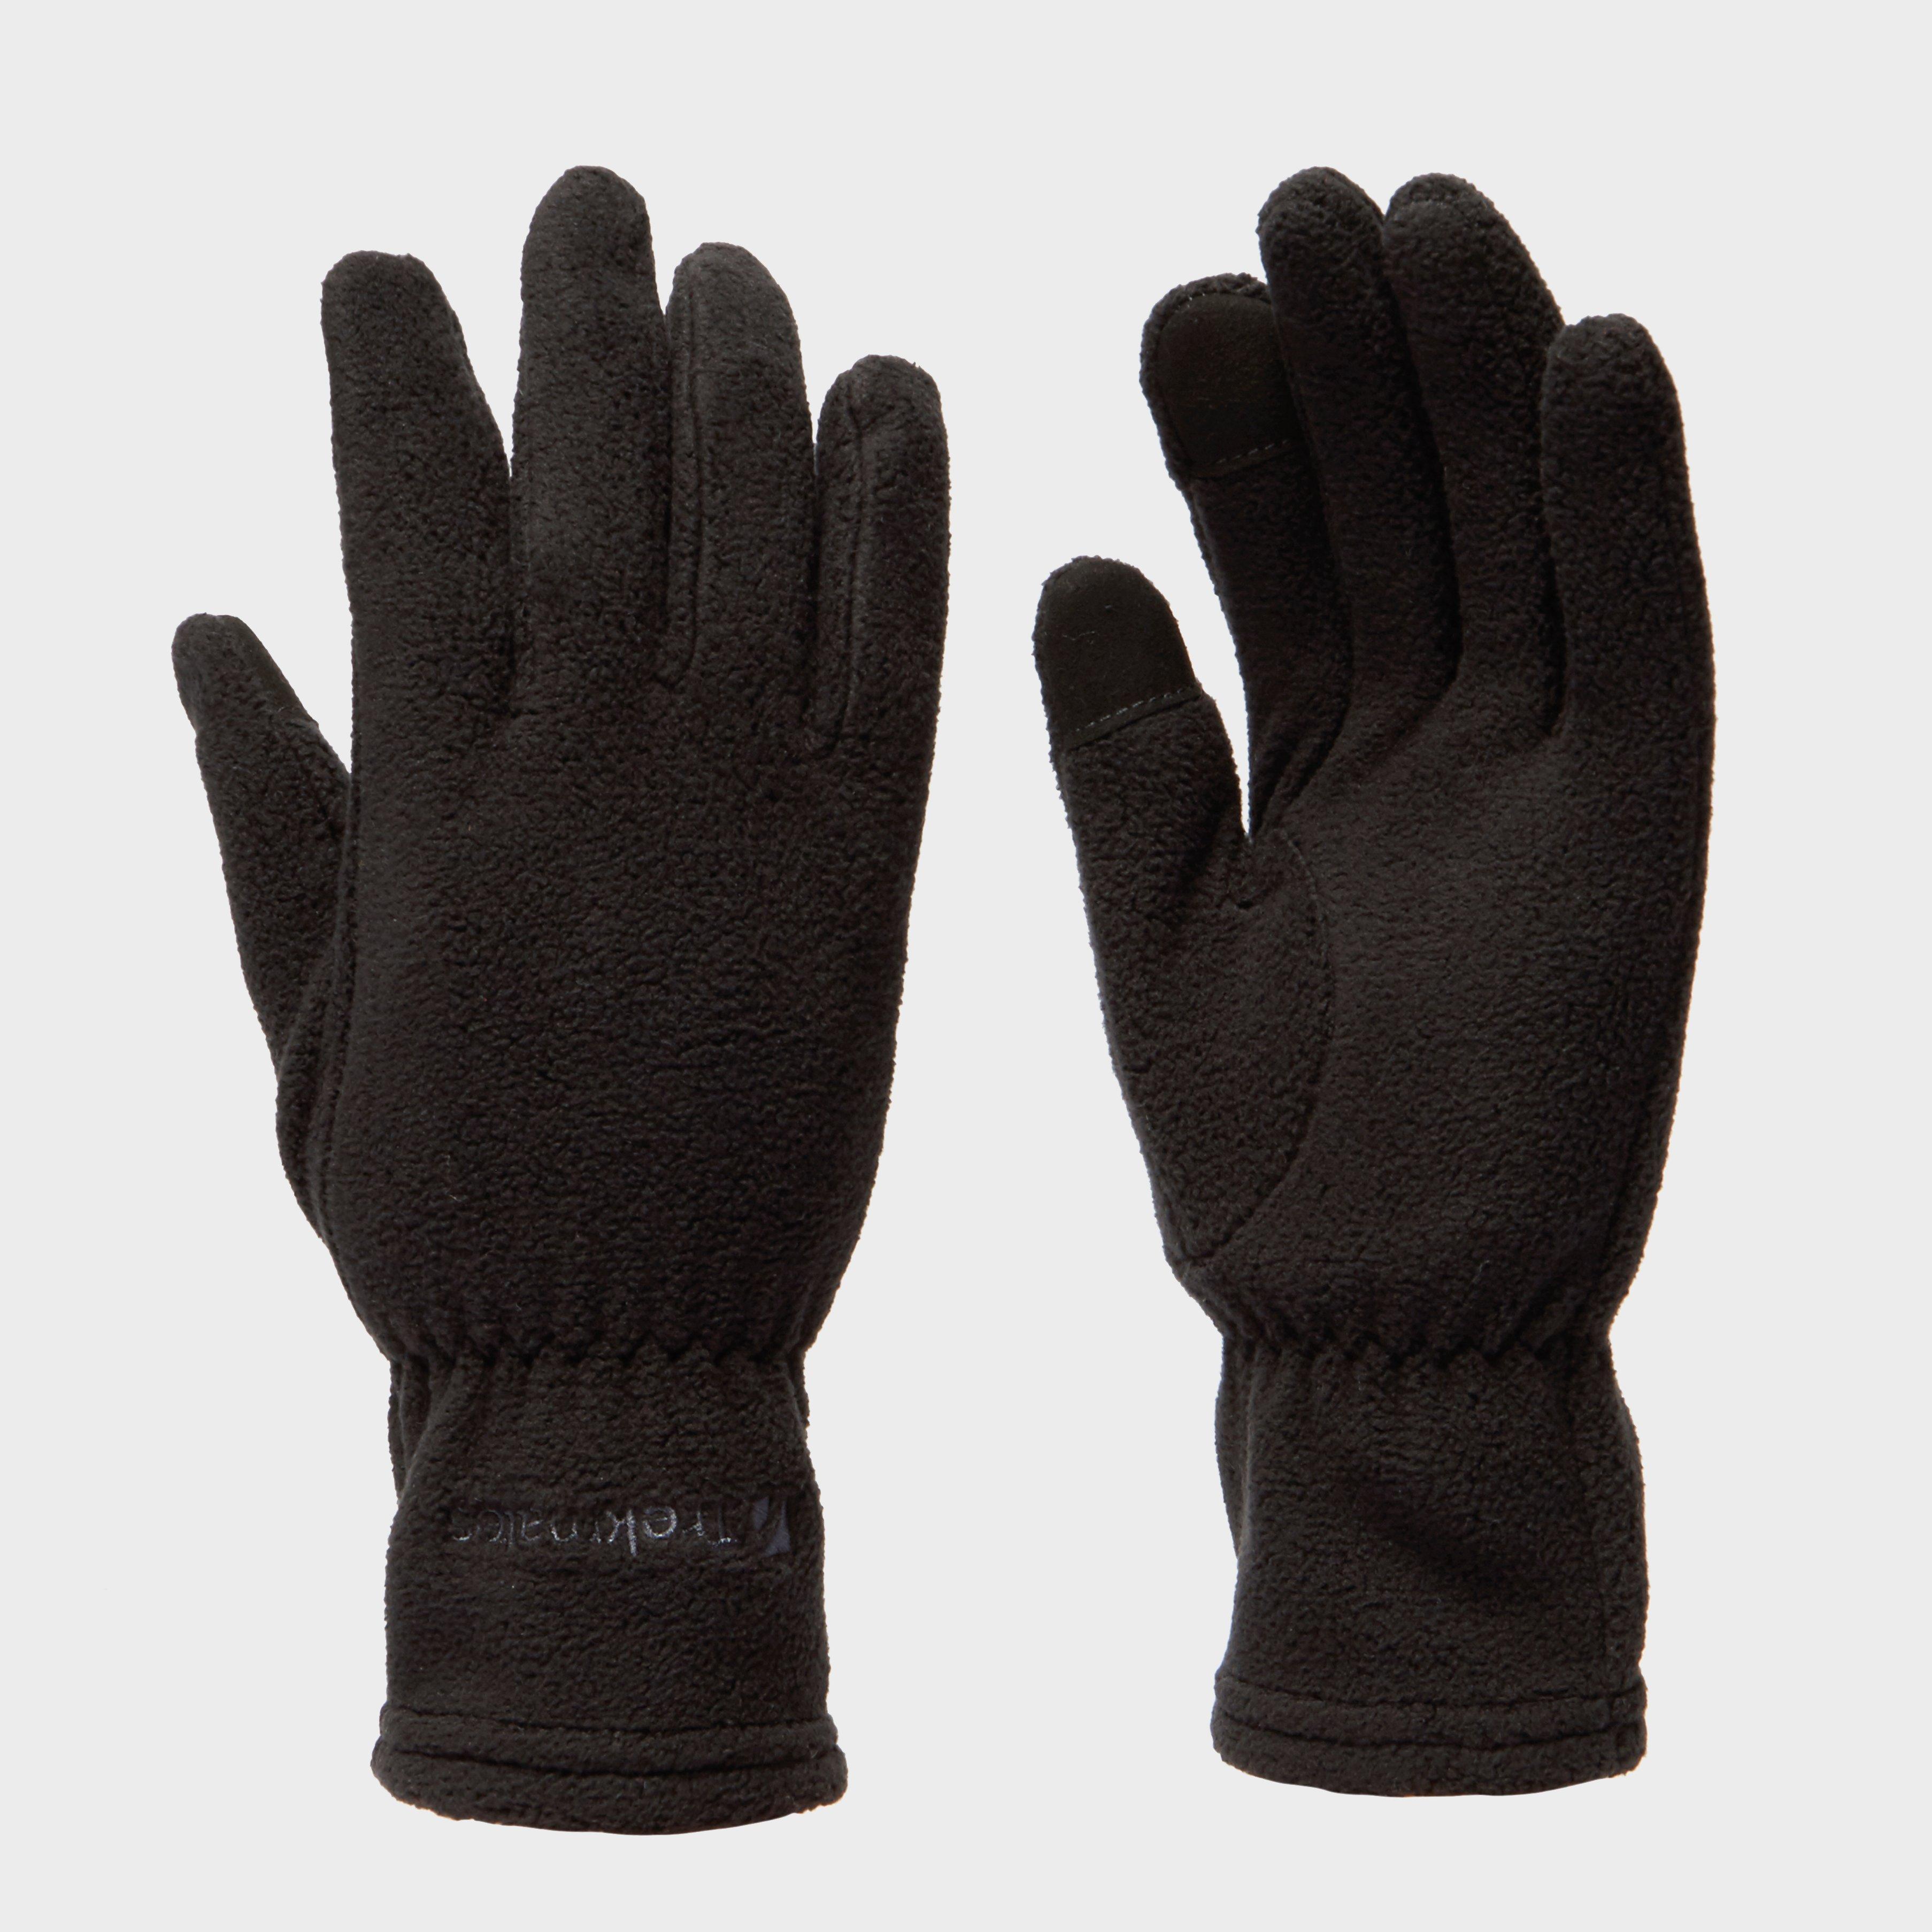 Trekmates Women's Touchscreen Fleece Gloves, Black